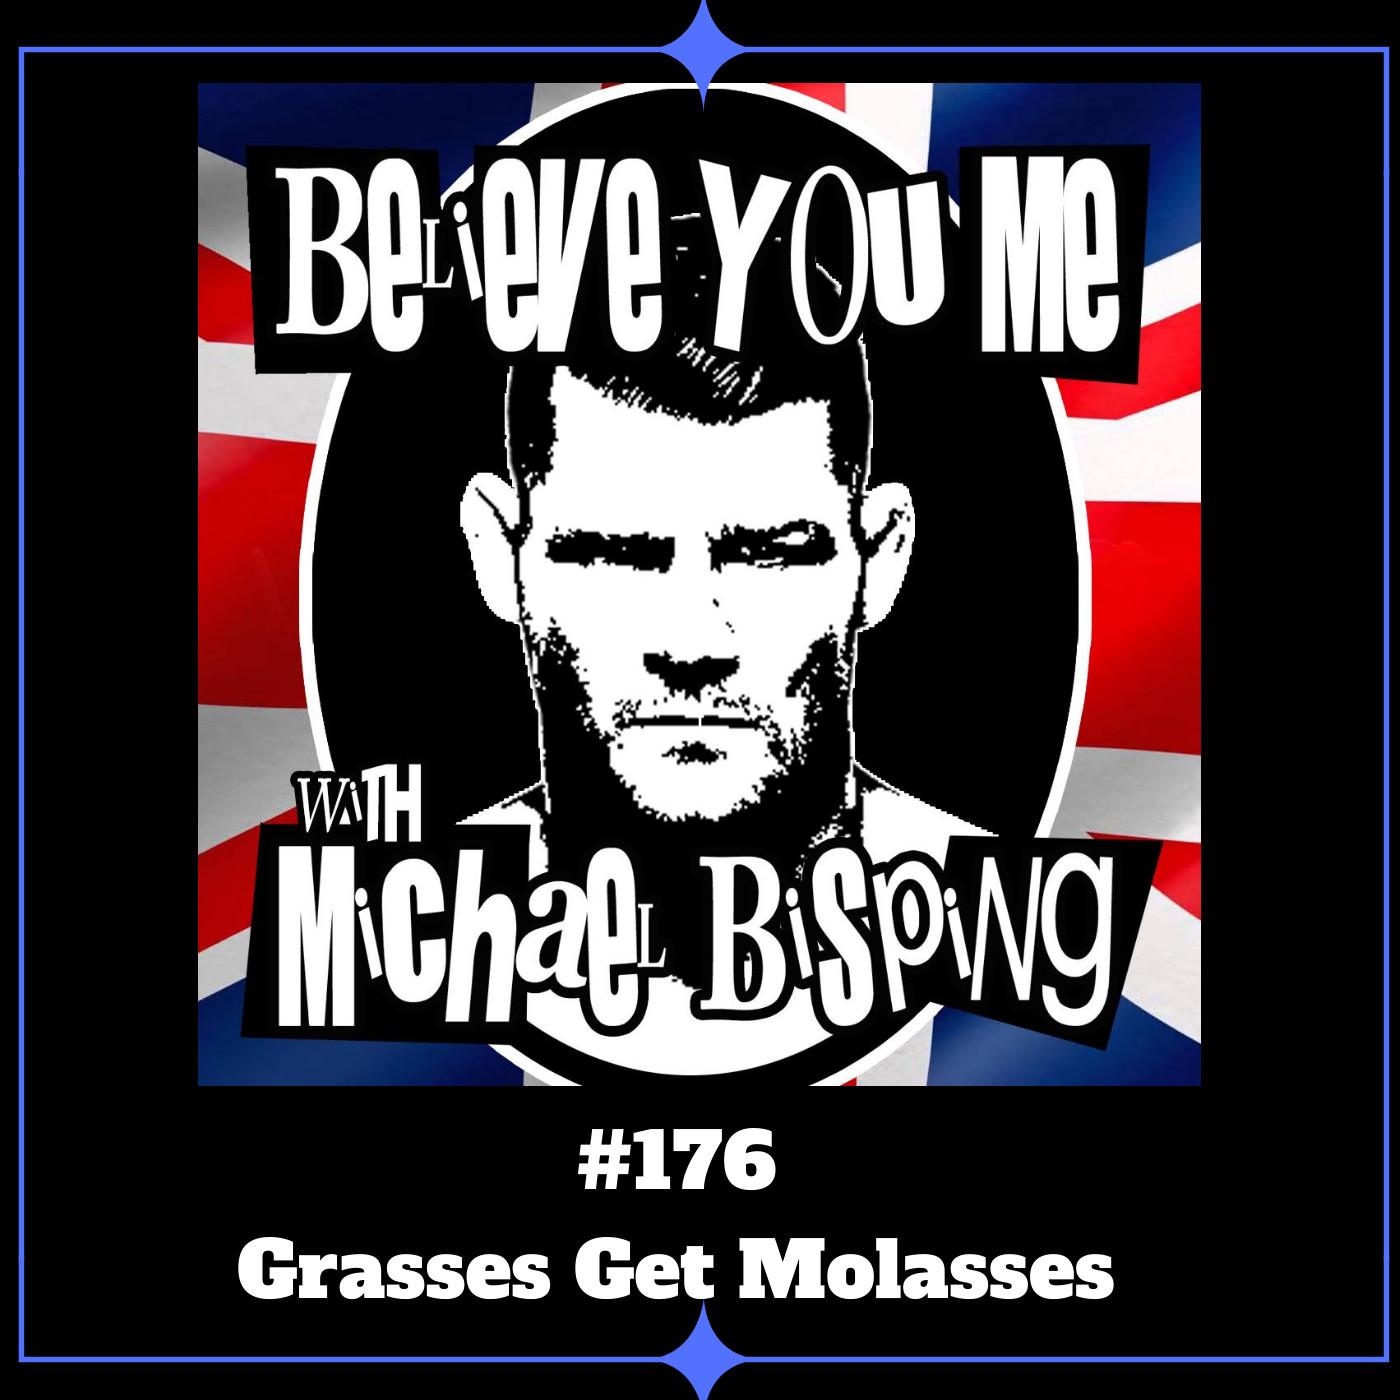 176 - Grasses Get Molasses